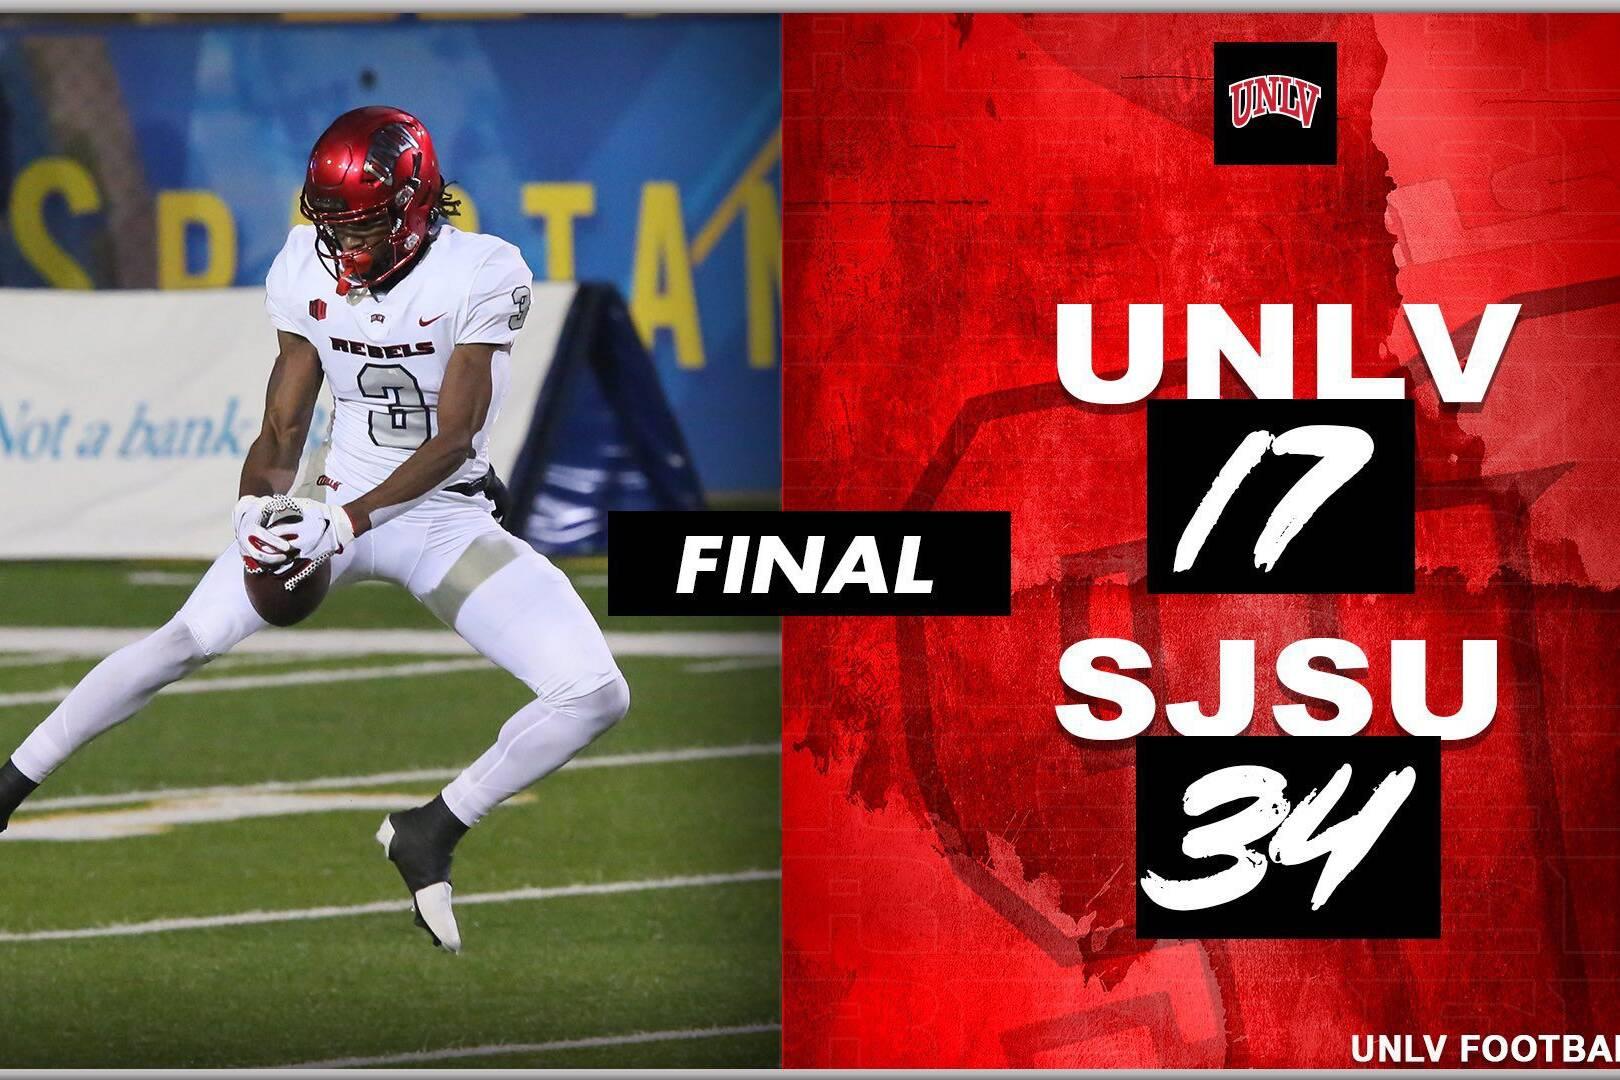 UNLV vs San Jose State